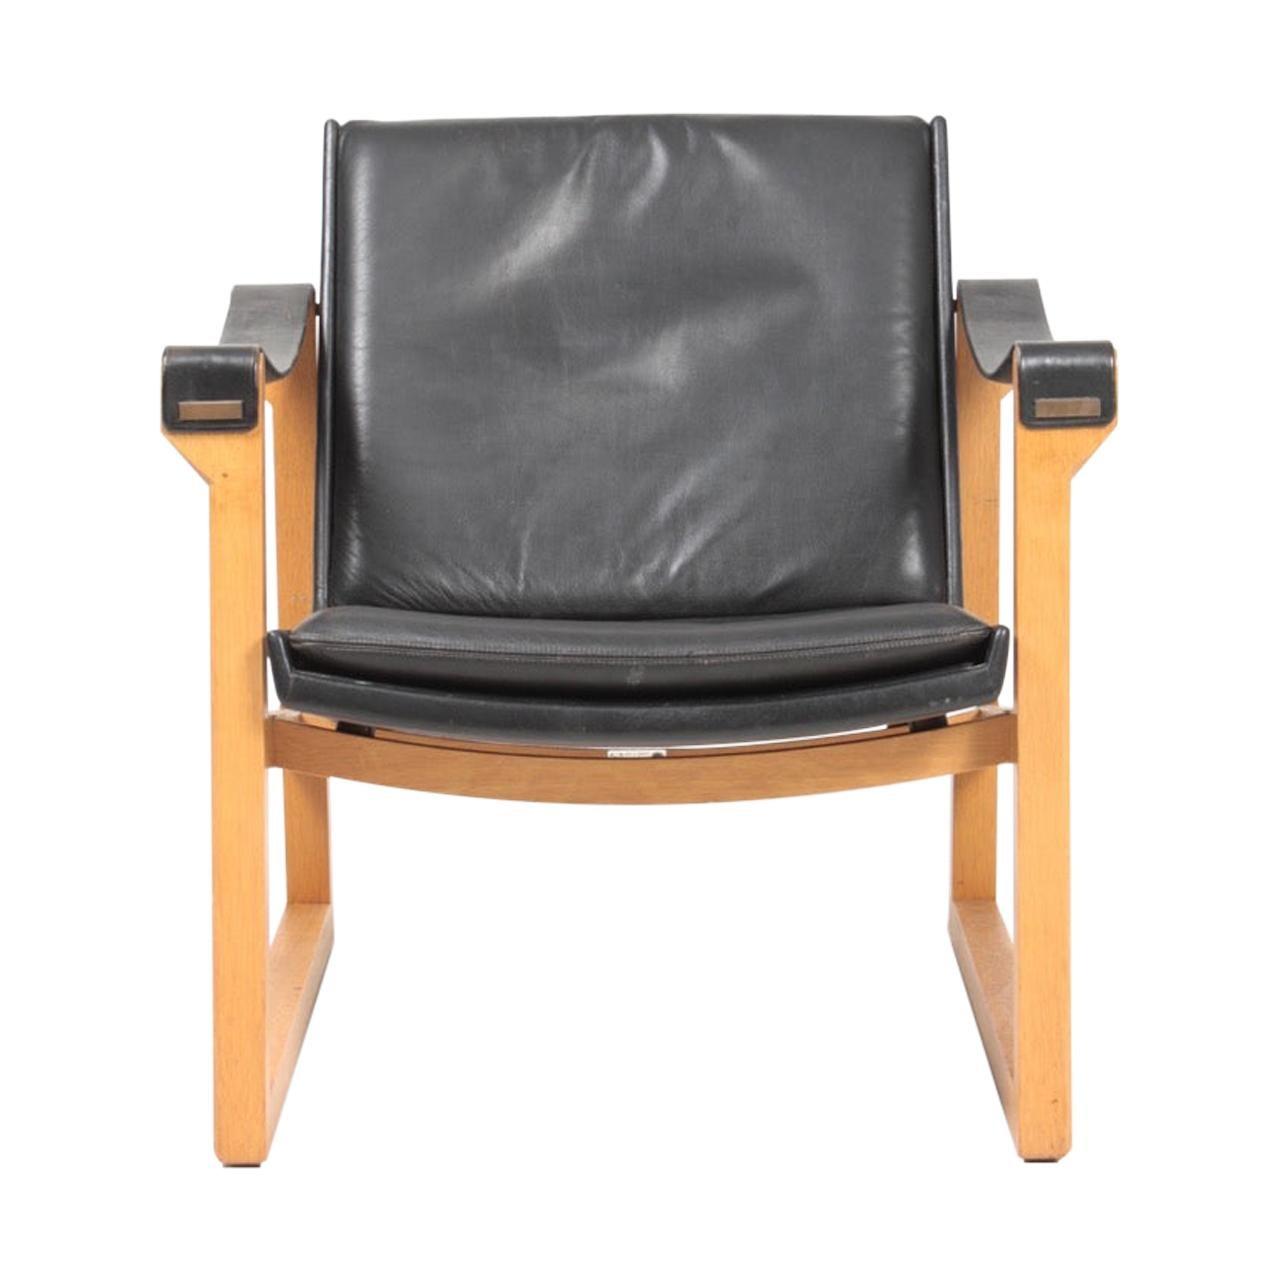 Midcentury Lounge Chair in Leather by Karen & Ebbe Clemmesen, Danish Design